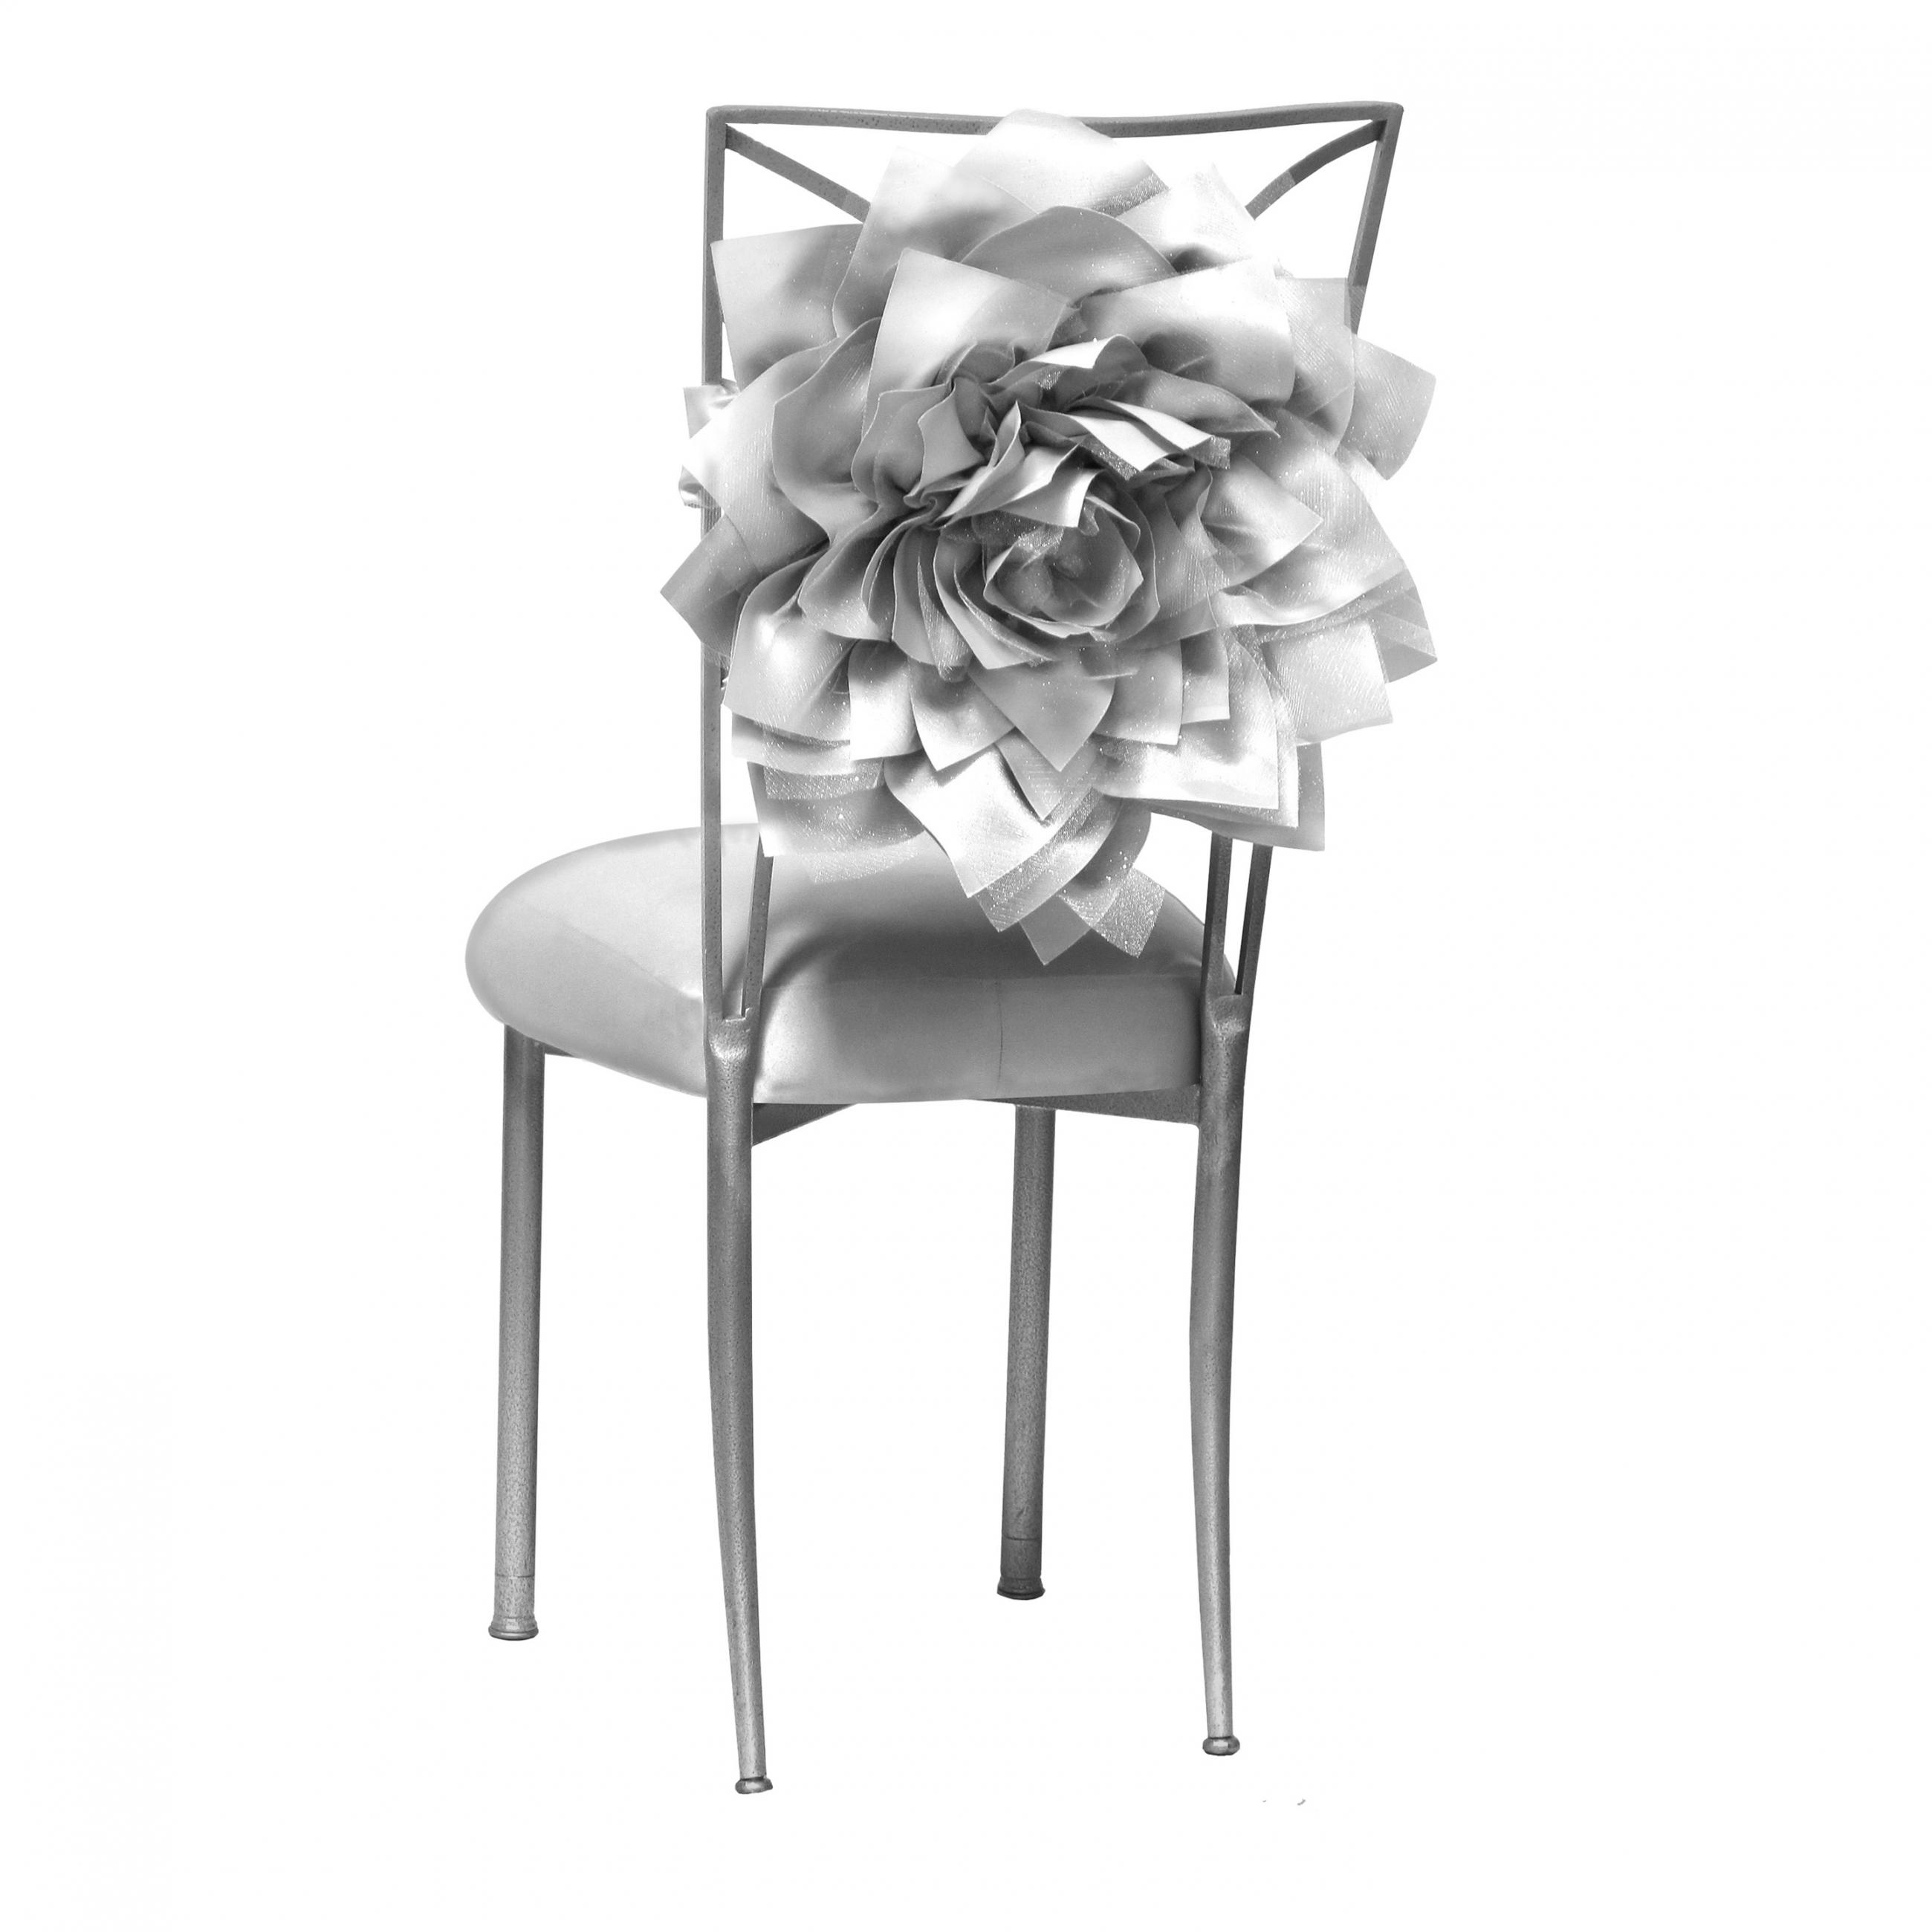 Strange Satin Silver Bloom Fanfare Chameleon Chair Topper Peak Theyellowbook Wood Chair Design Ideas Theyellowbookinfo